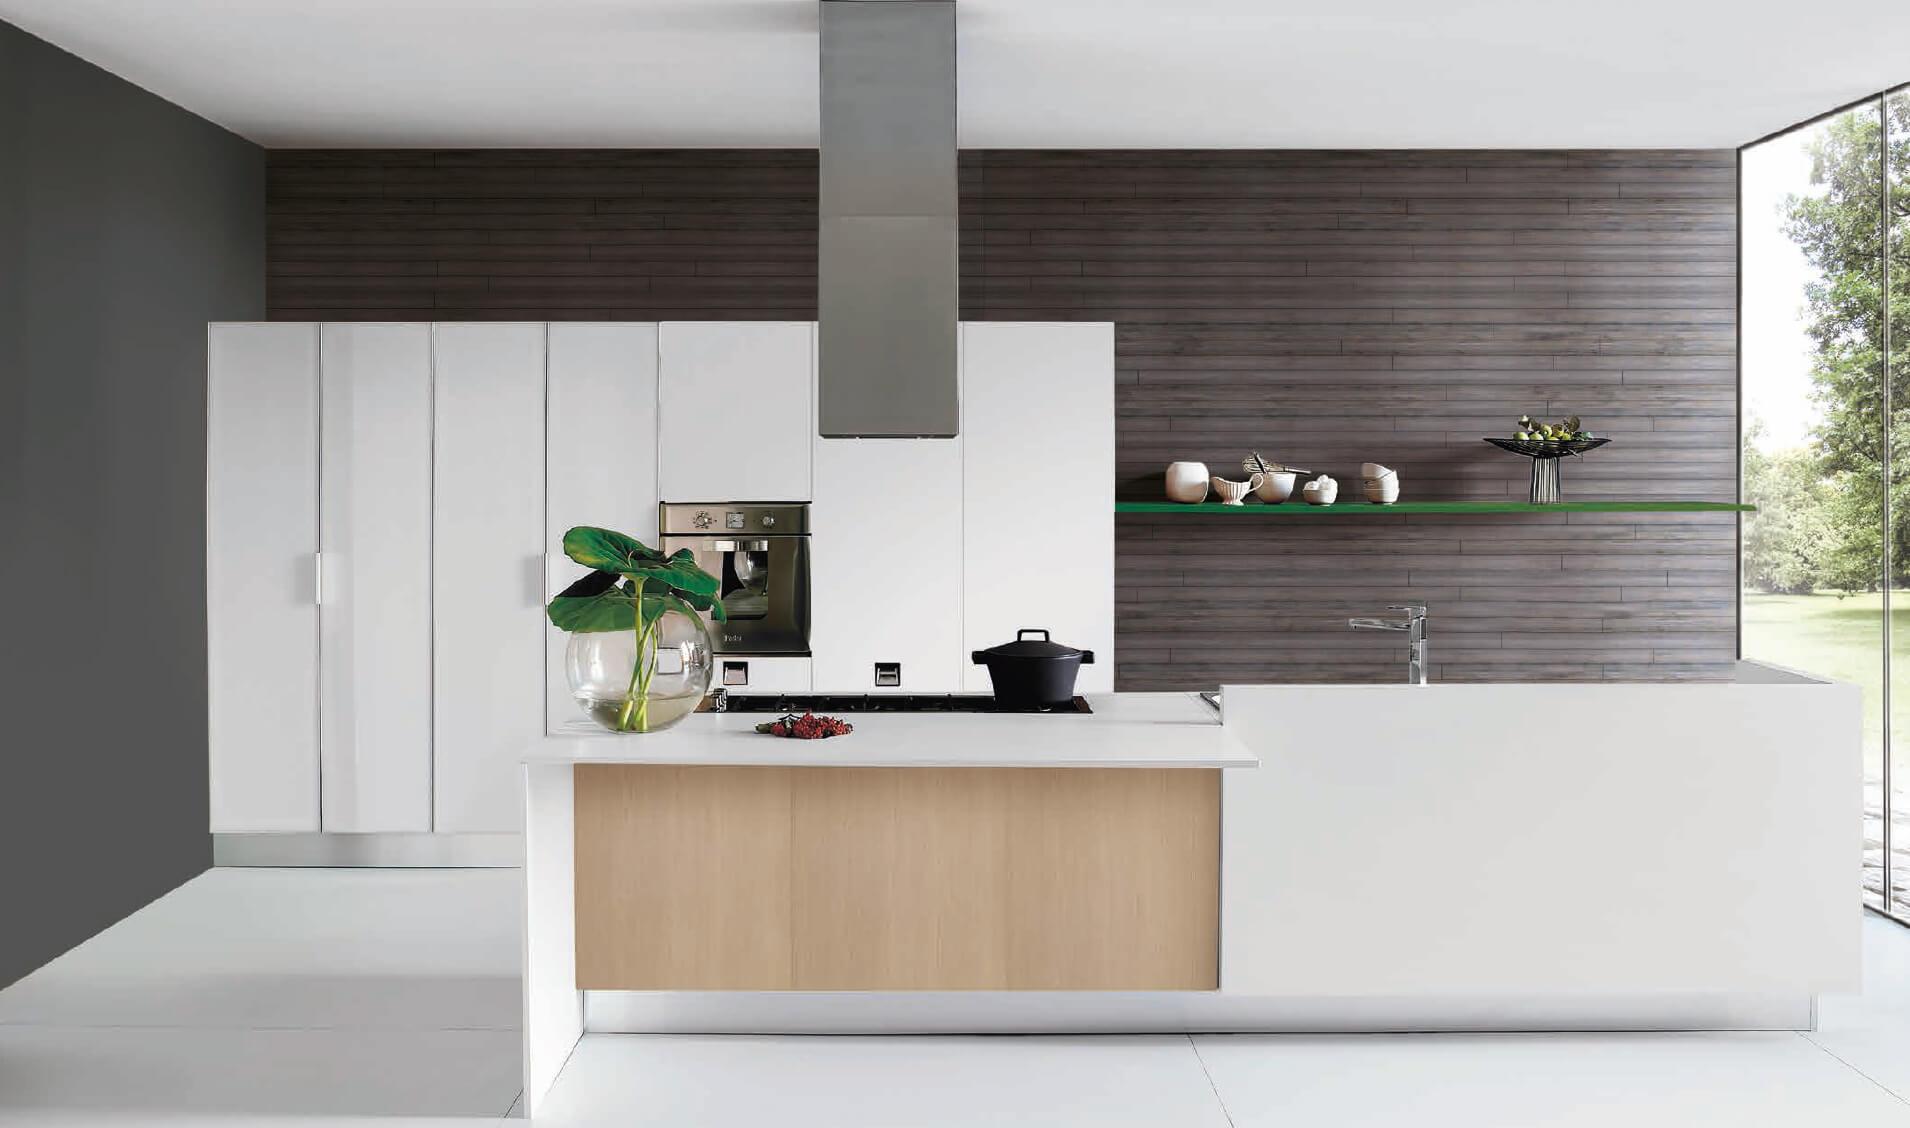 Modele penelope - finition blanc et bois